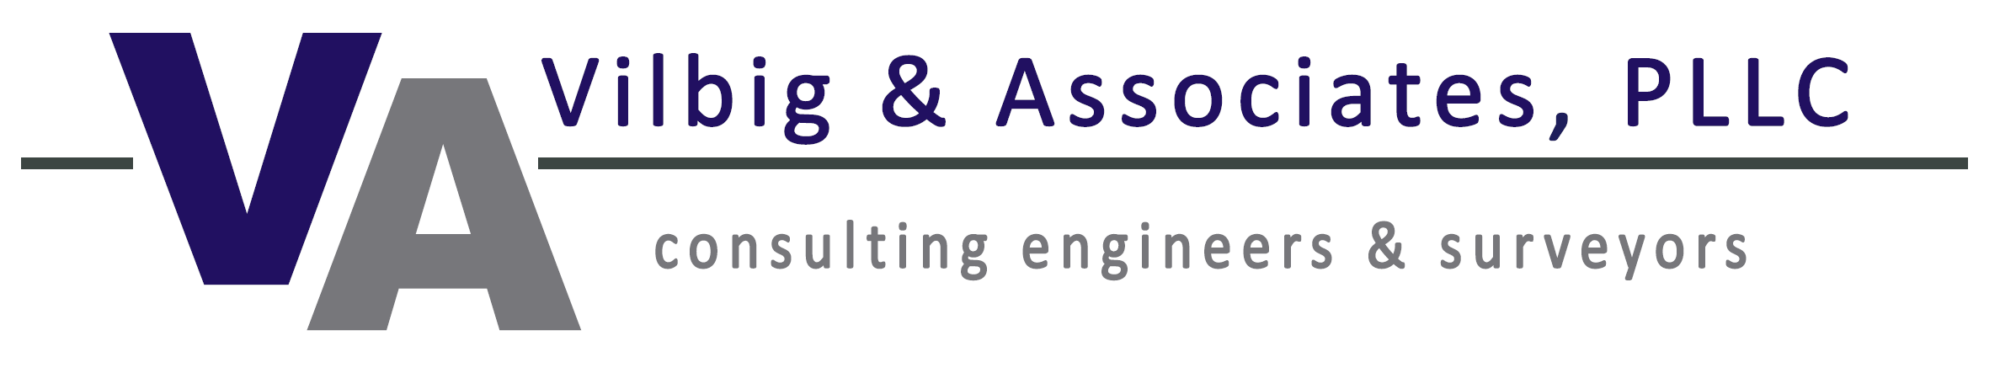 Vilbig & Associates